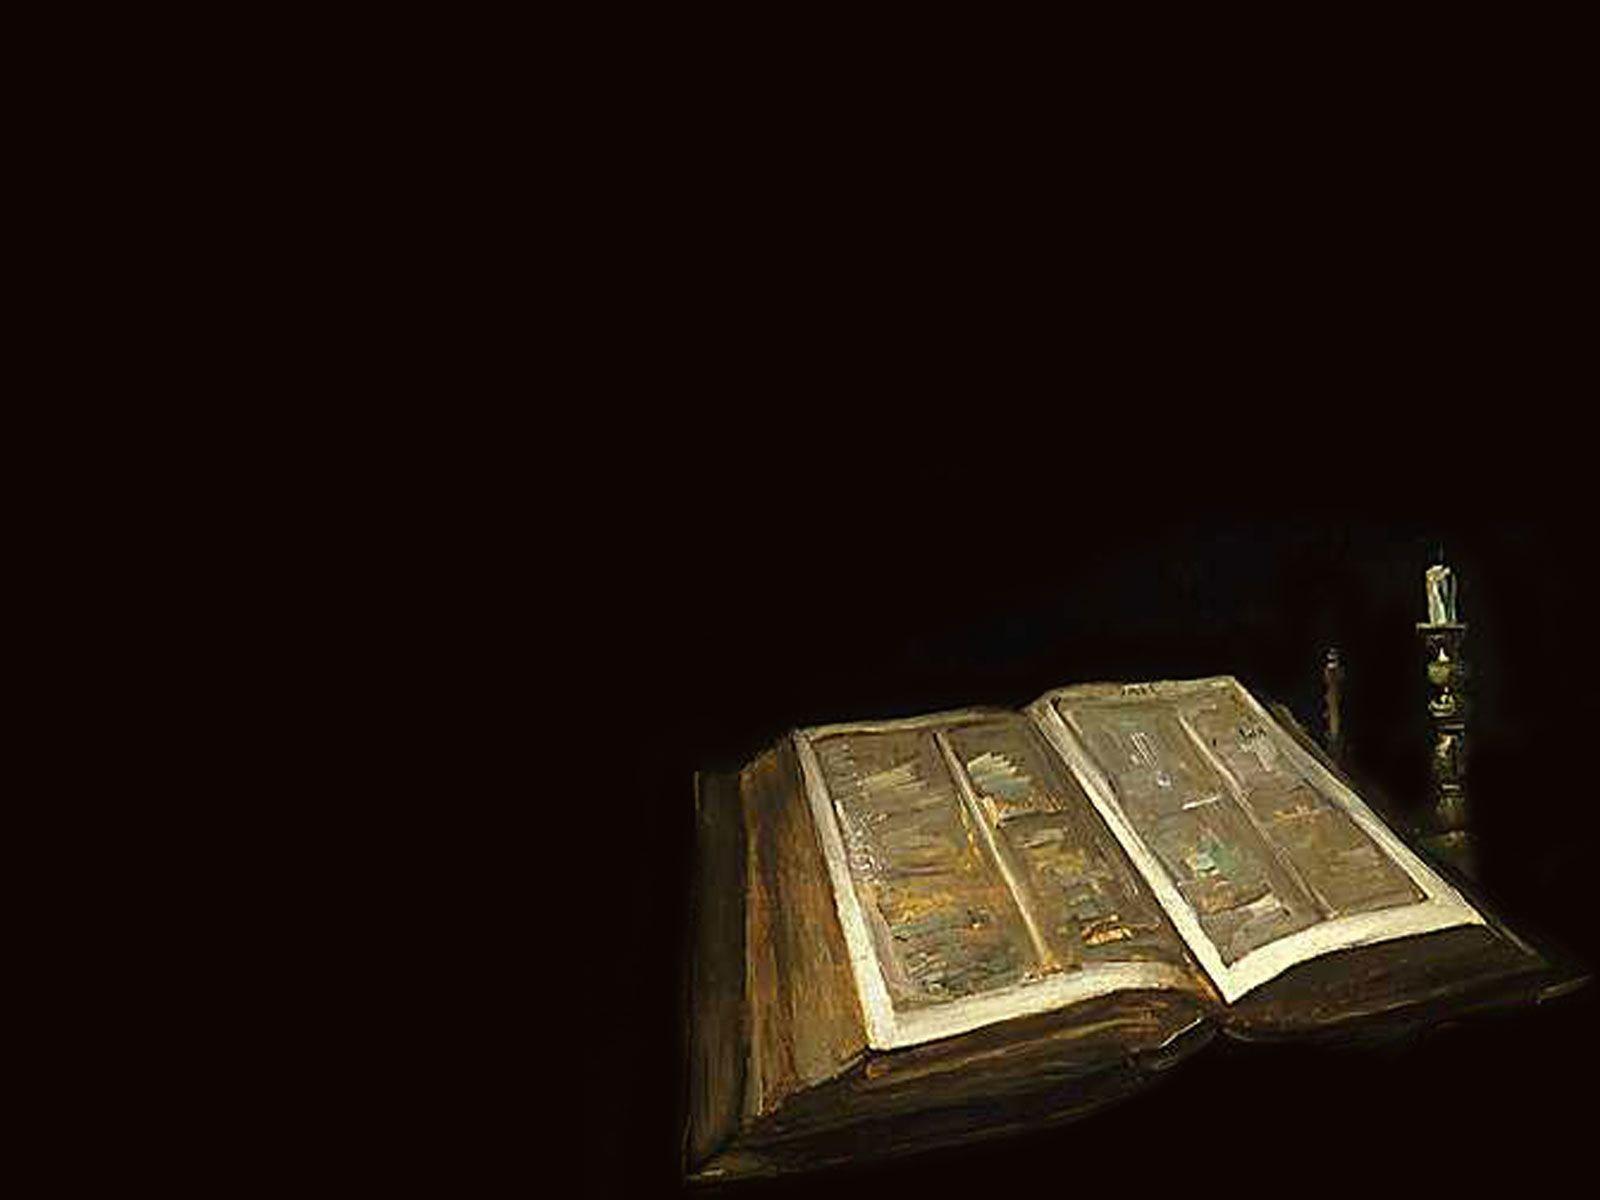 выбор библия картинки для презентации на окно под